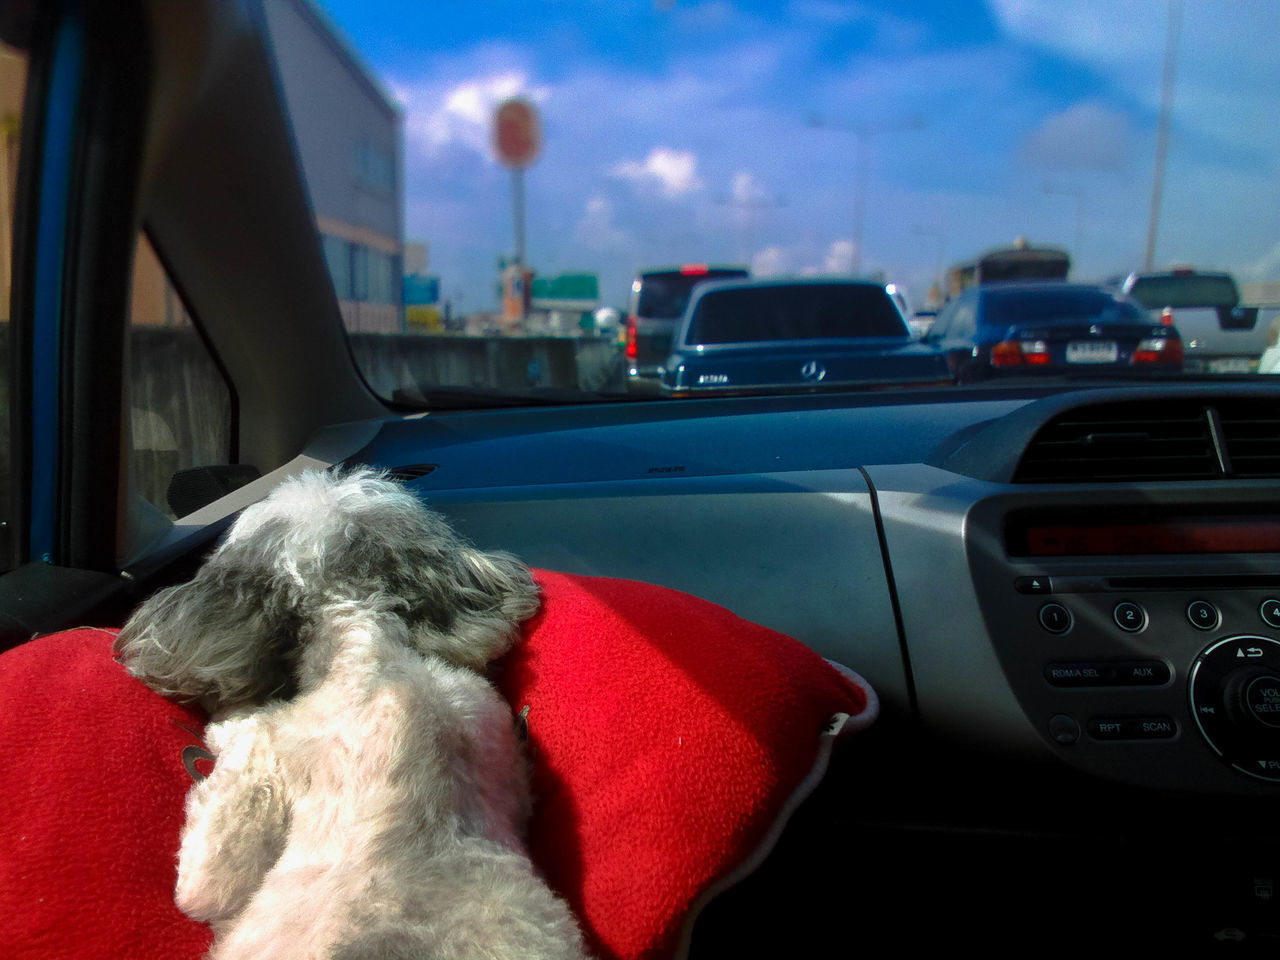 car, transportation, land vehicle, car interior, mode of transport, vehicle interior, one animal, road trip, travel, mammal, day, dog, real people, domestic animals, pets, animal themes, outdoors, sky, city, close-up